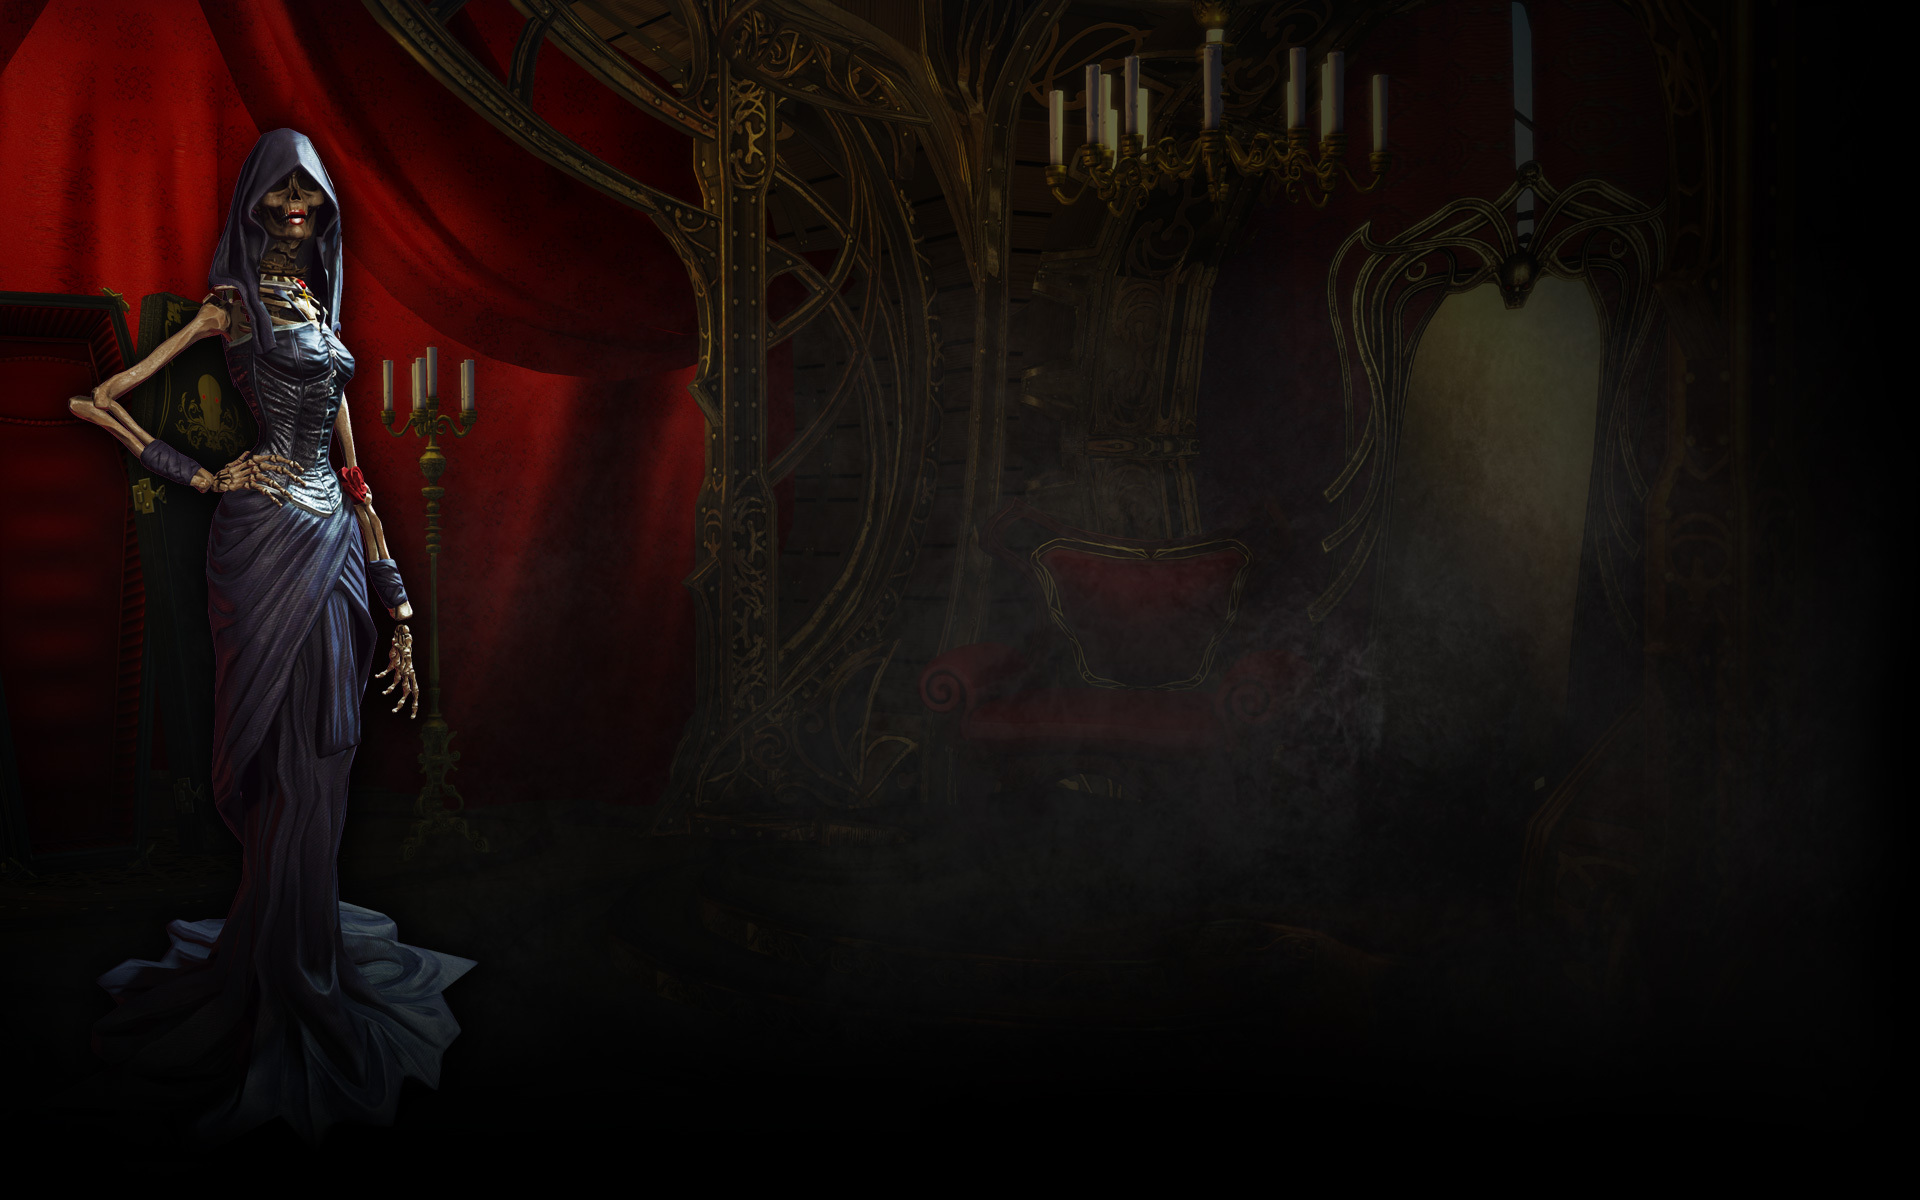 Ophelia the Undead Princess